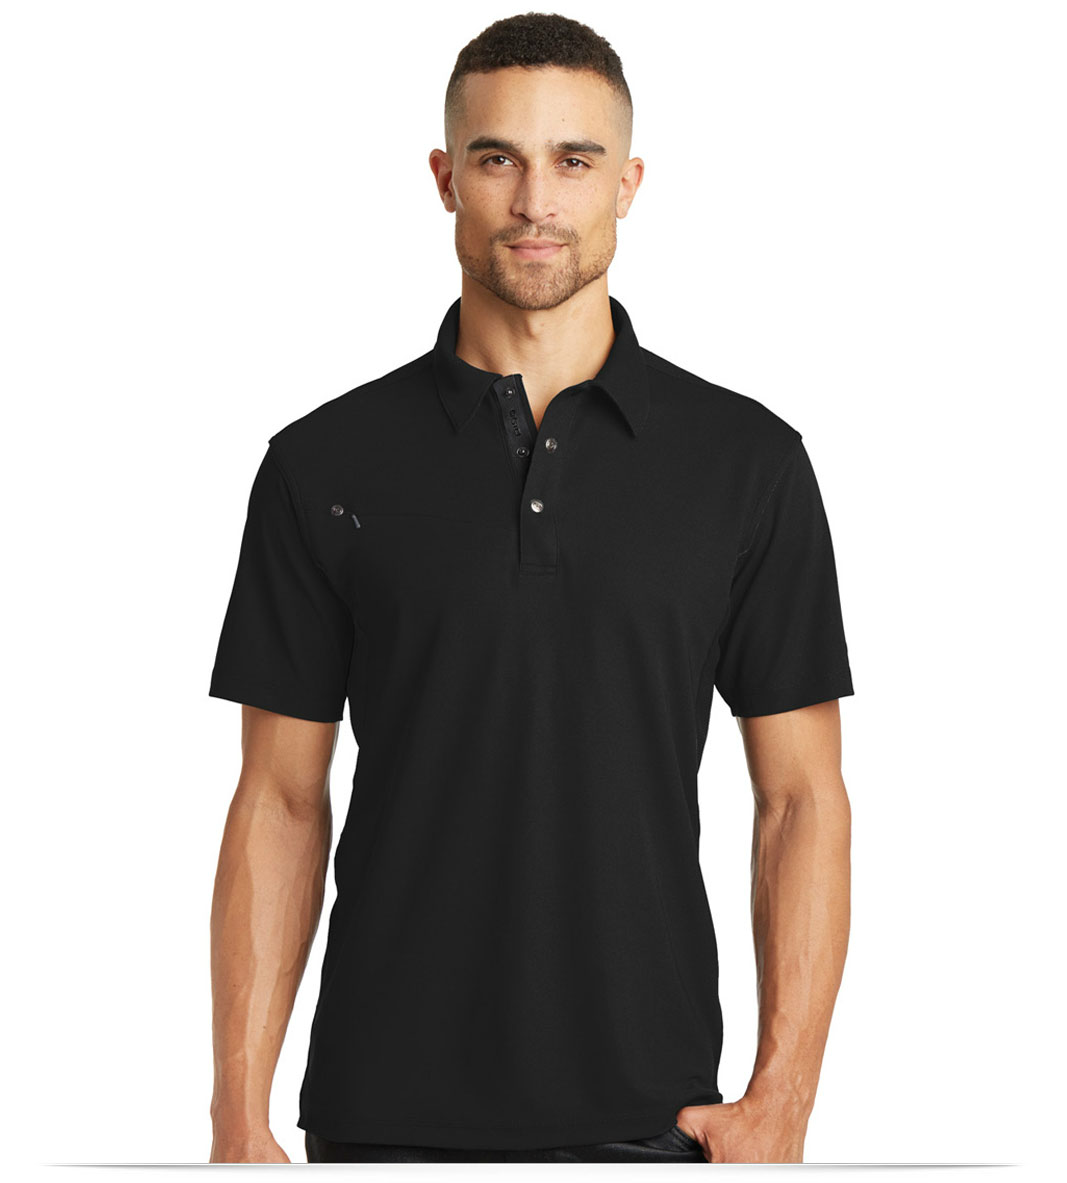 e03125bd Design Embroidered Custom Logo Ogio Polo Shirt Online | AllStar Logo